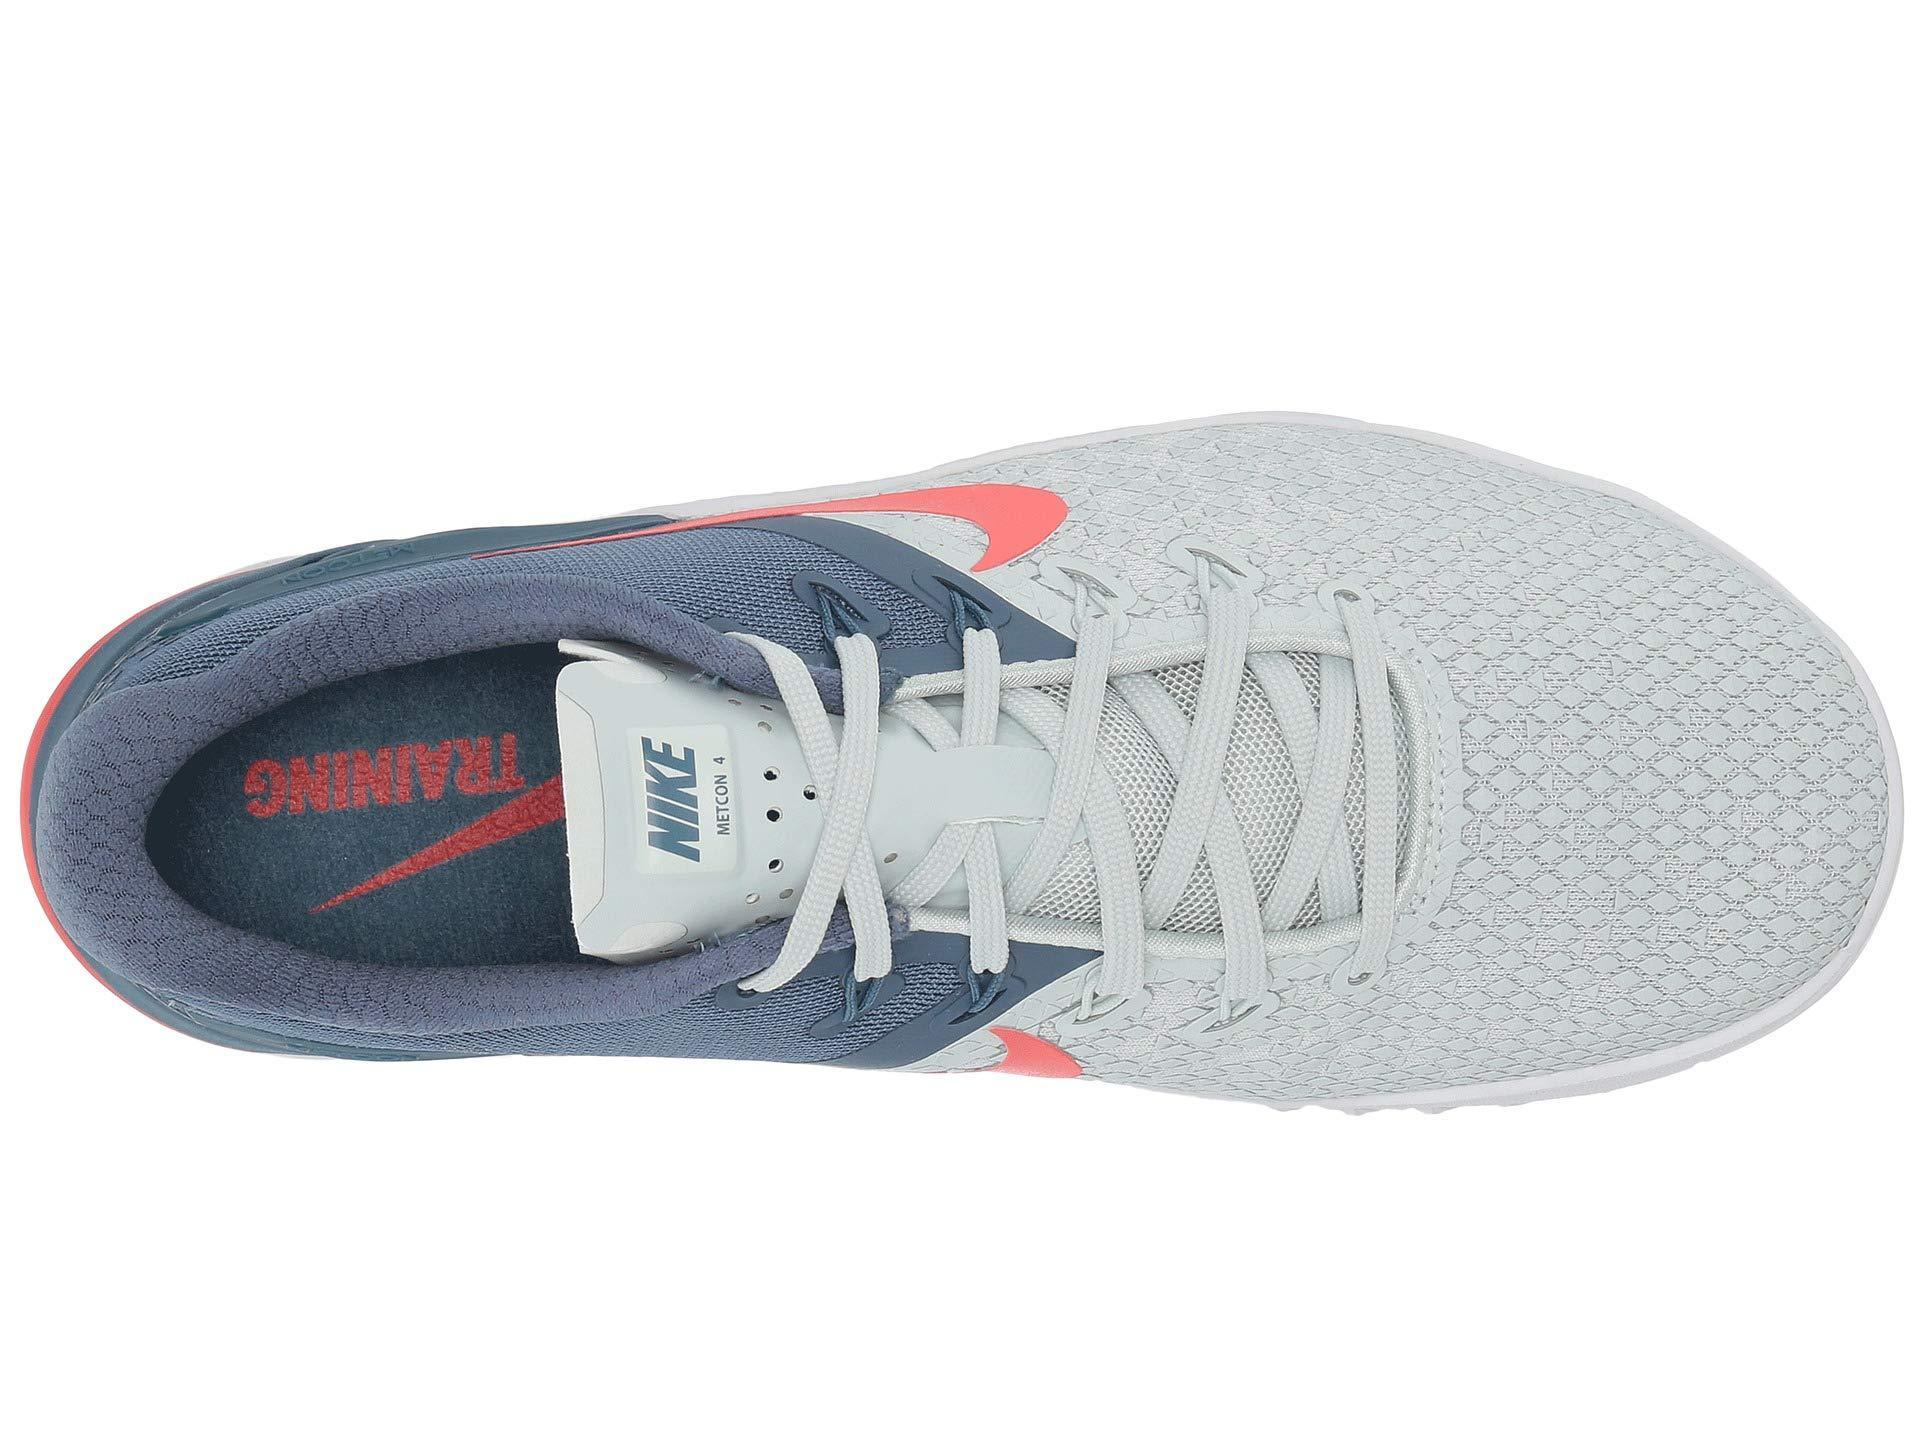 a8ca34b184ae6 Nike - Multicolor Metcon 4 Xd (atmosphere Grey true Berry plum Dust). View  fullscreen